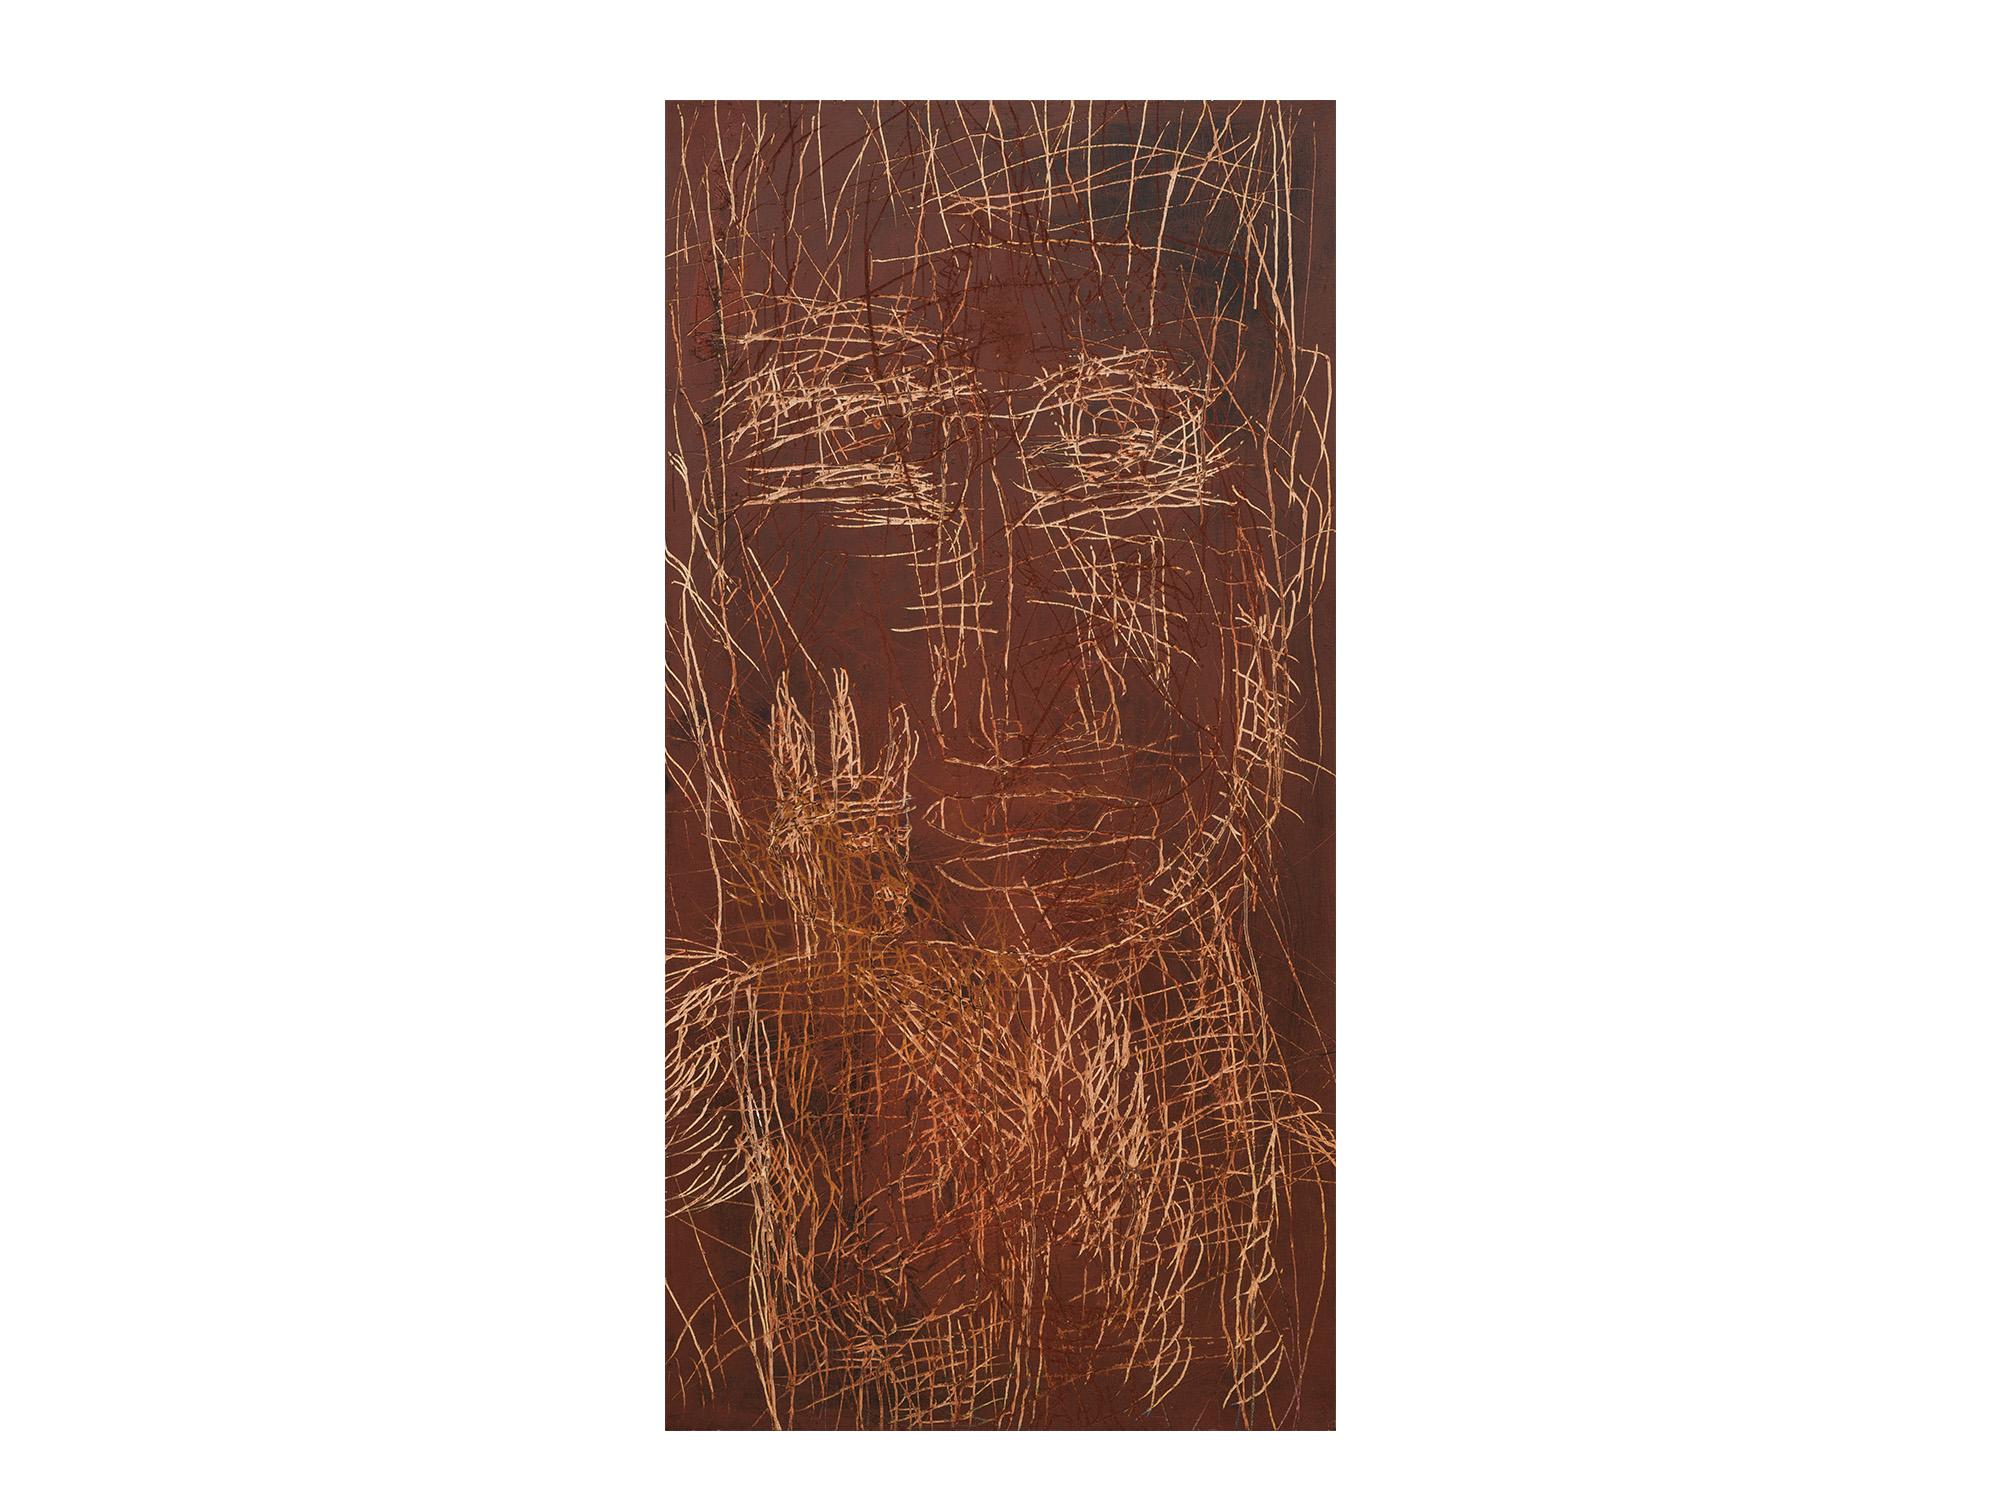 Robert Doble   Rising , 2018 oil on archival marine ply 122 x 61cm   ARTIST BIO